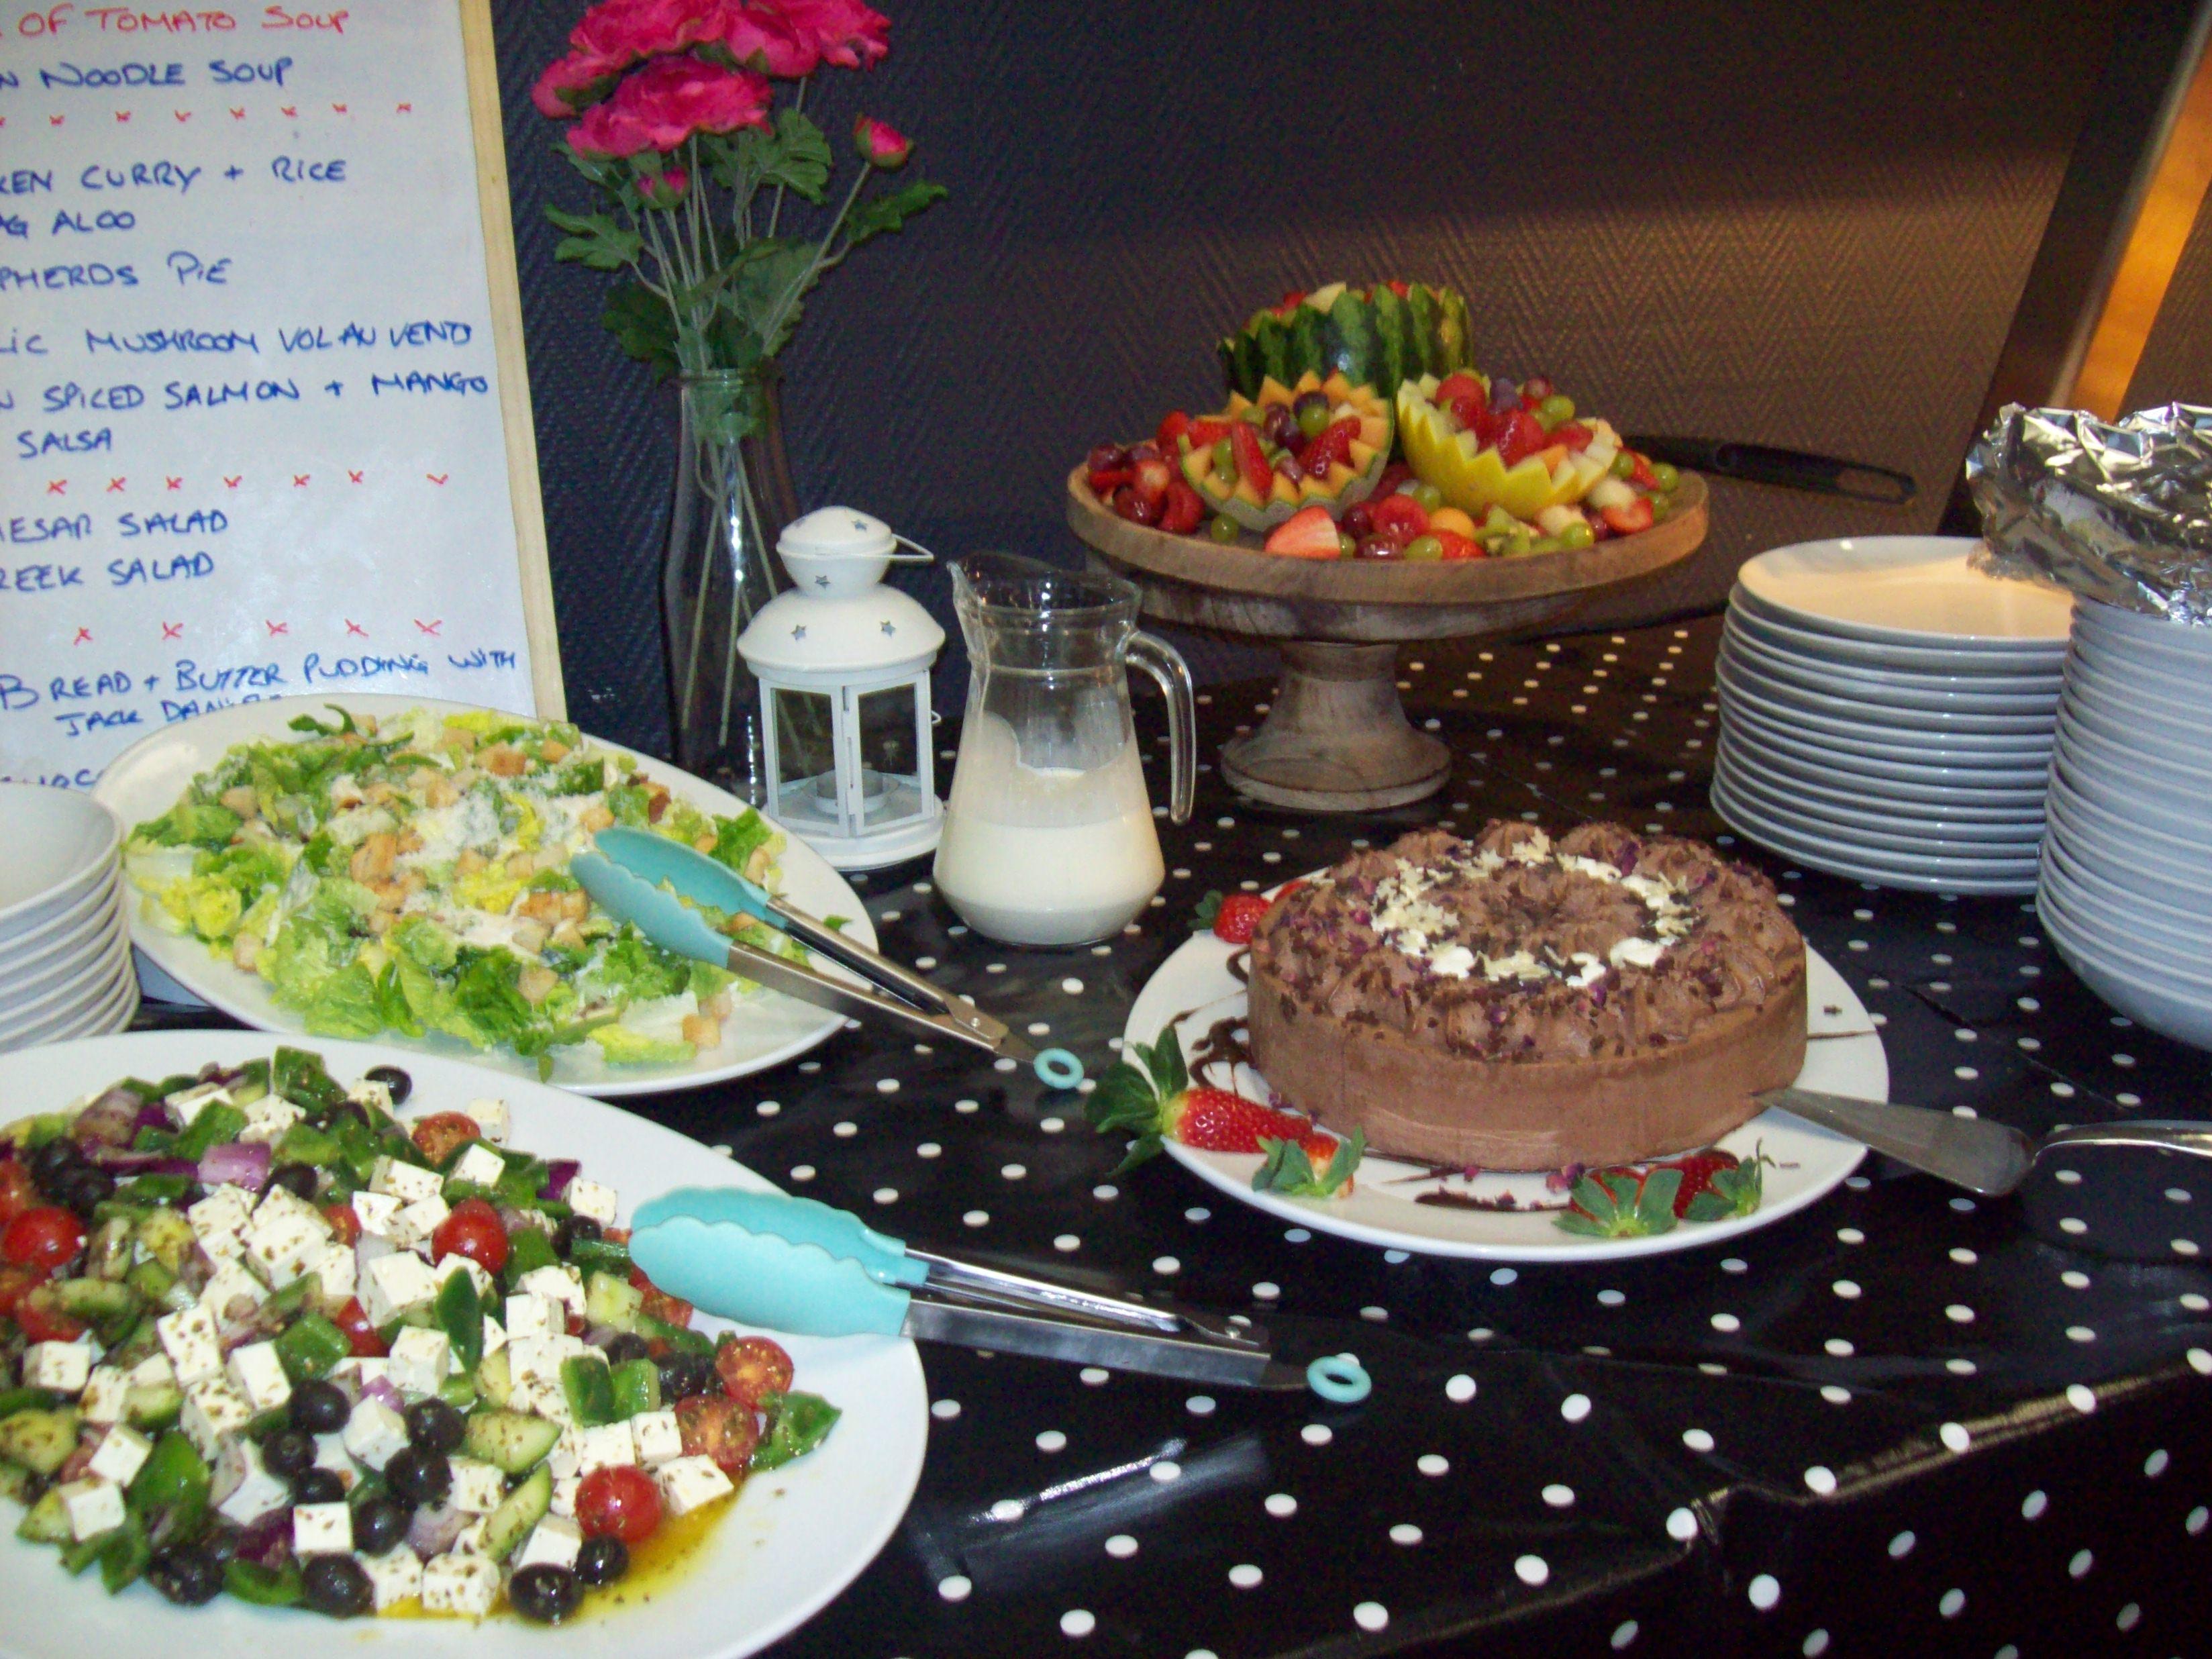 Dessert and salad station